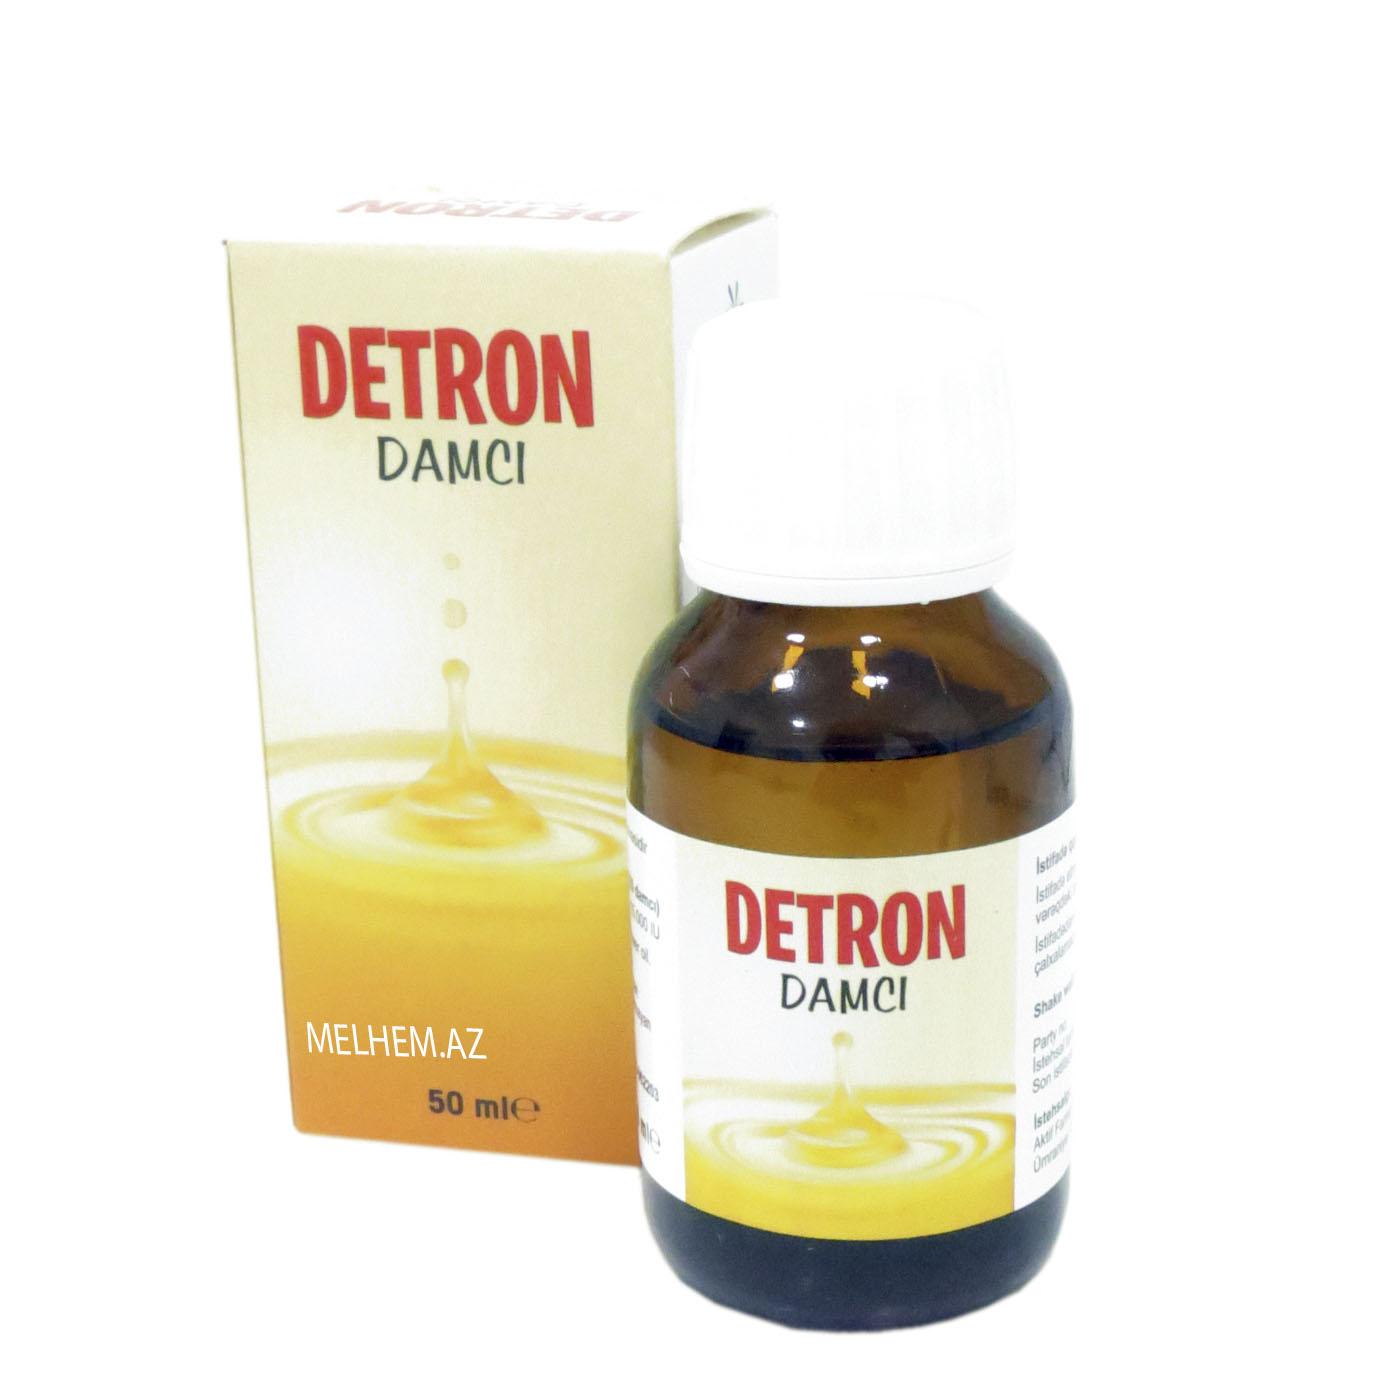 DETRON 50 ML (DAMCI)